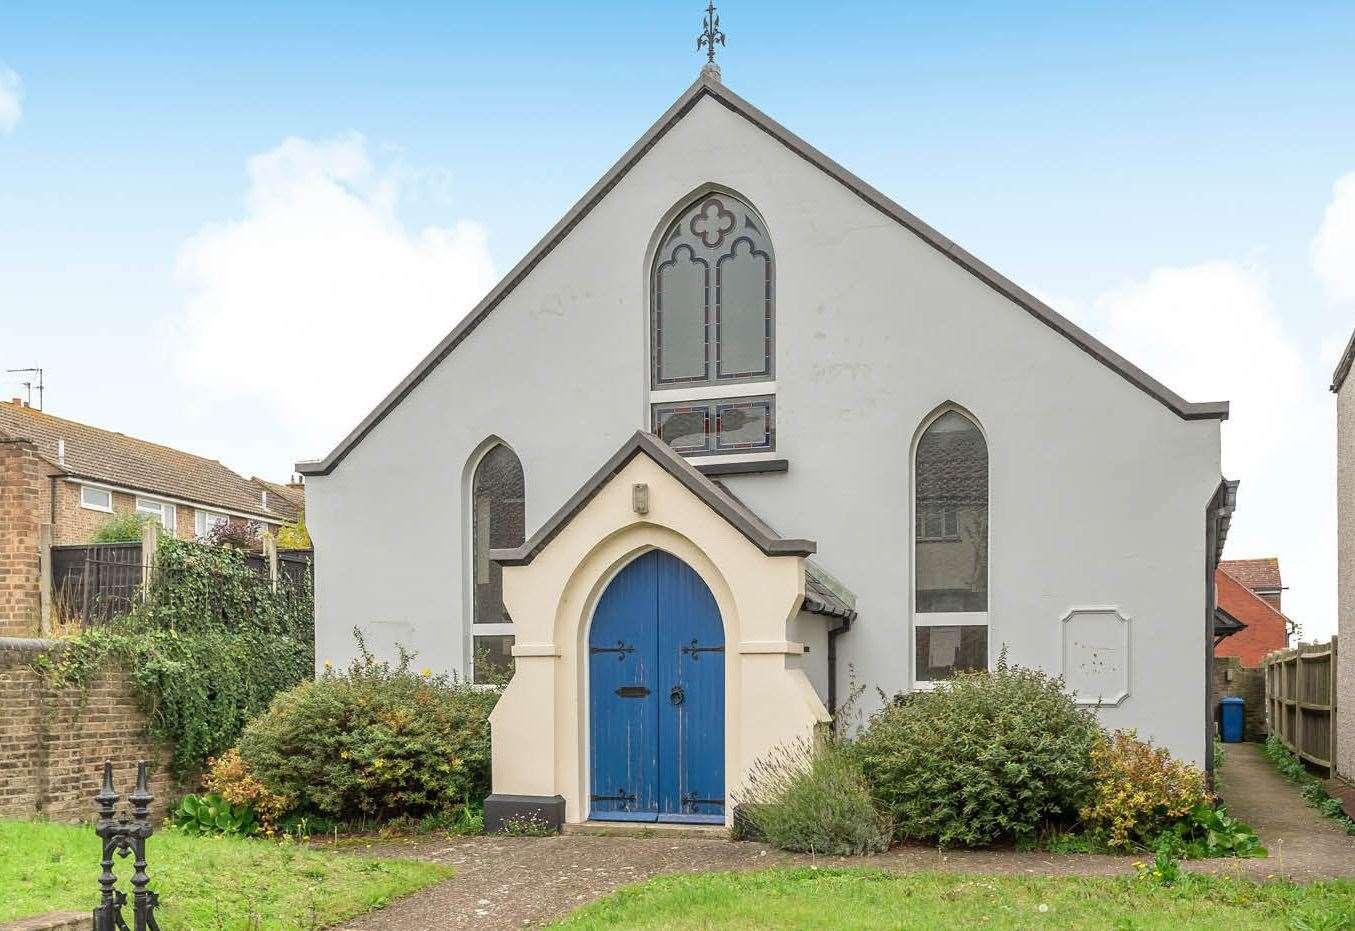 Former chapel goes up for sale - Kent Online